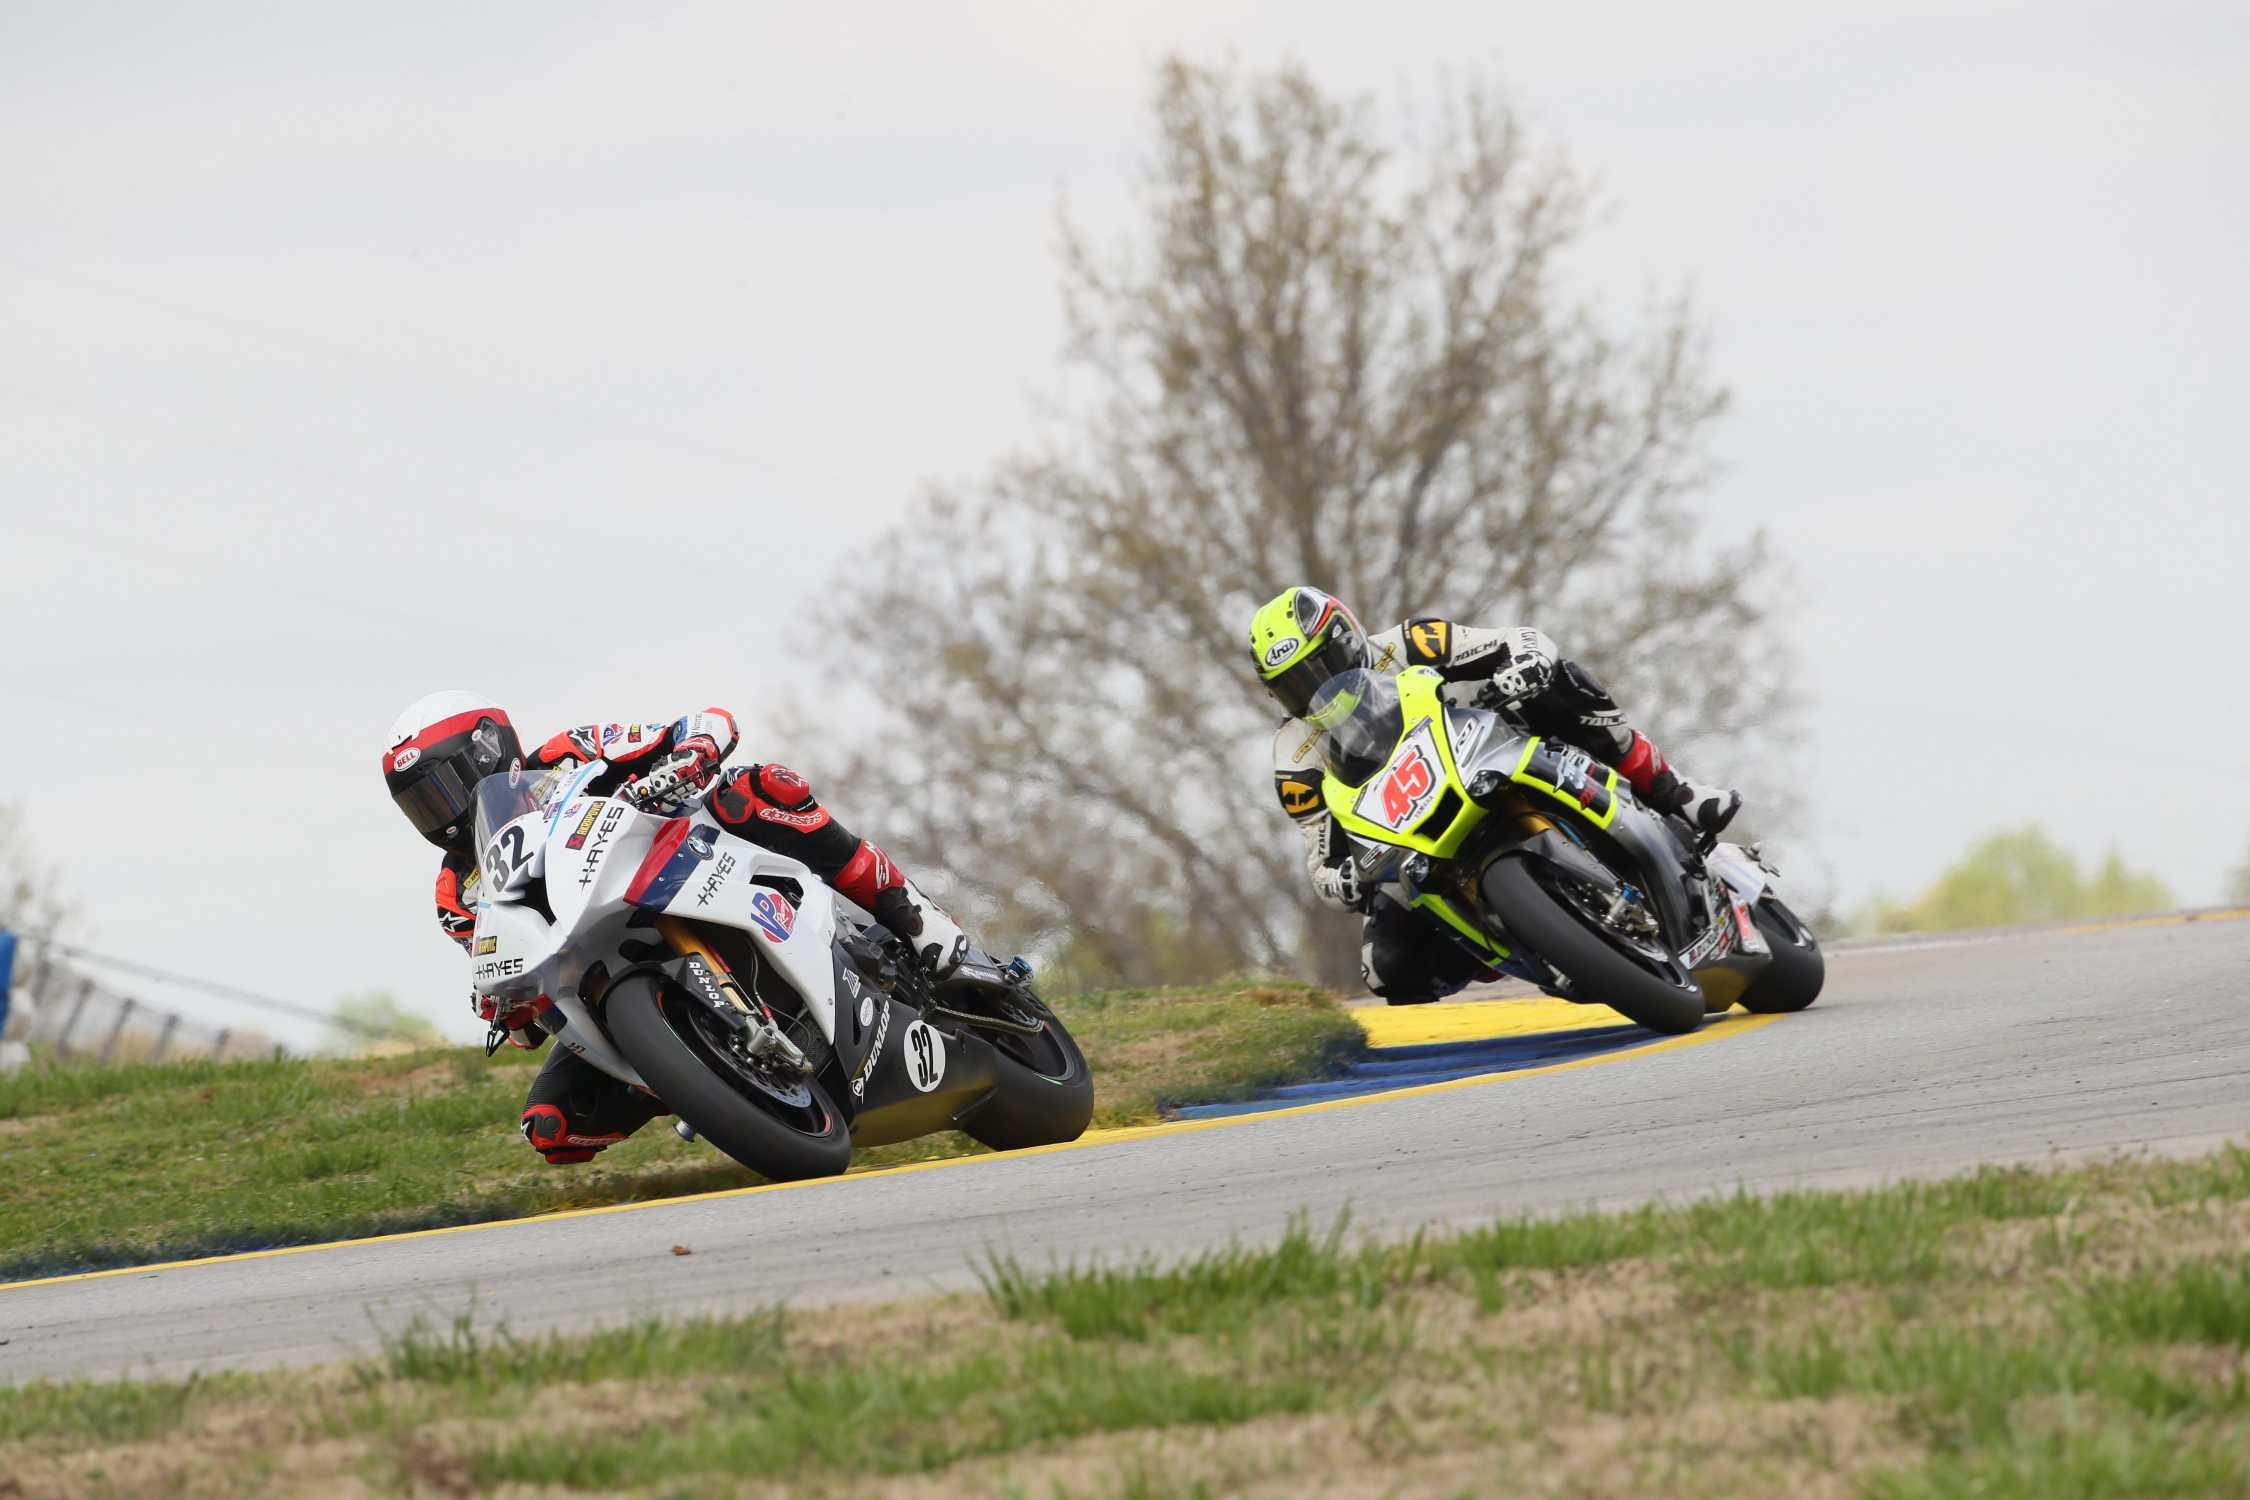 Road Atlanta Usa Motoamerica 07th April 2019 Team Bmw Scheibe Racing Rider Jack Cagne 32 Usa Riding The Bmw S1000rr